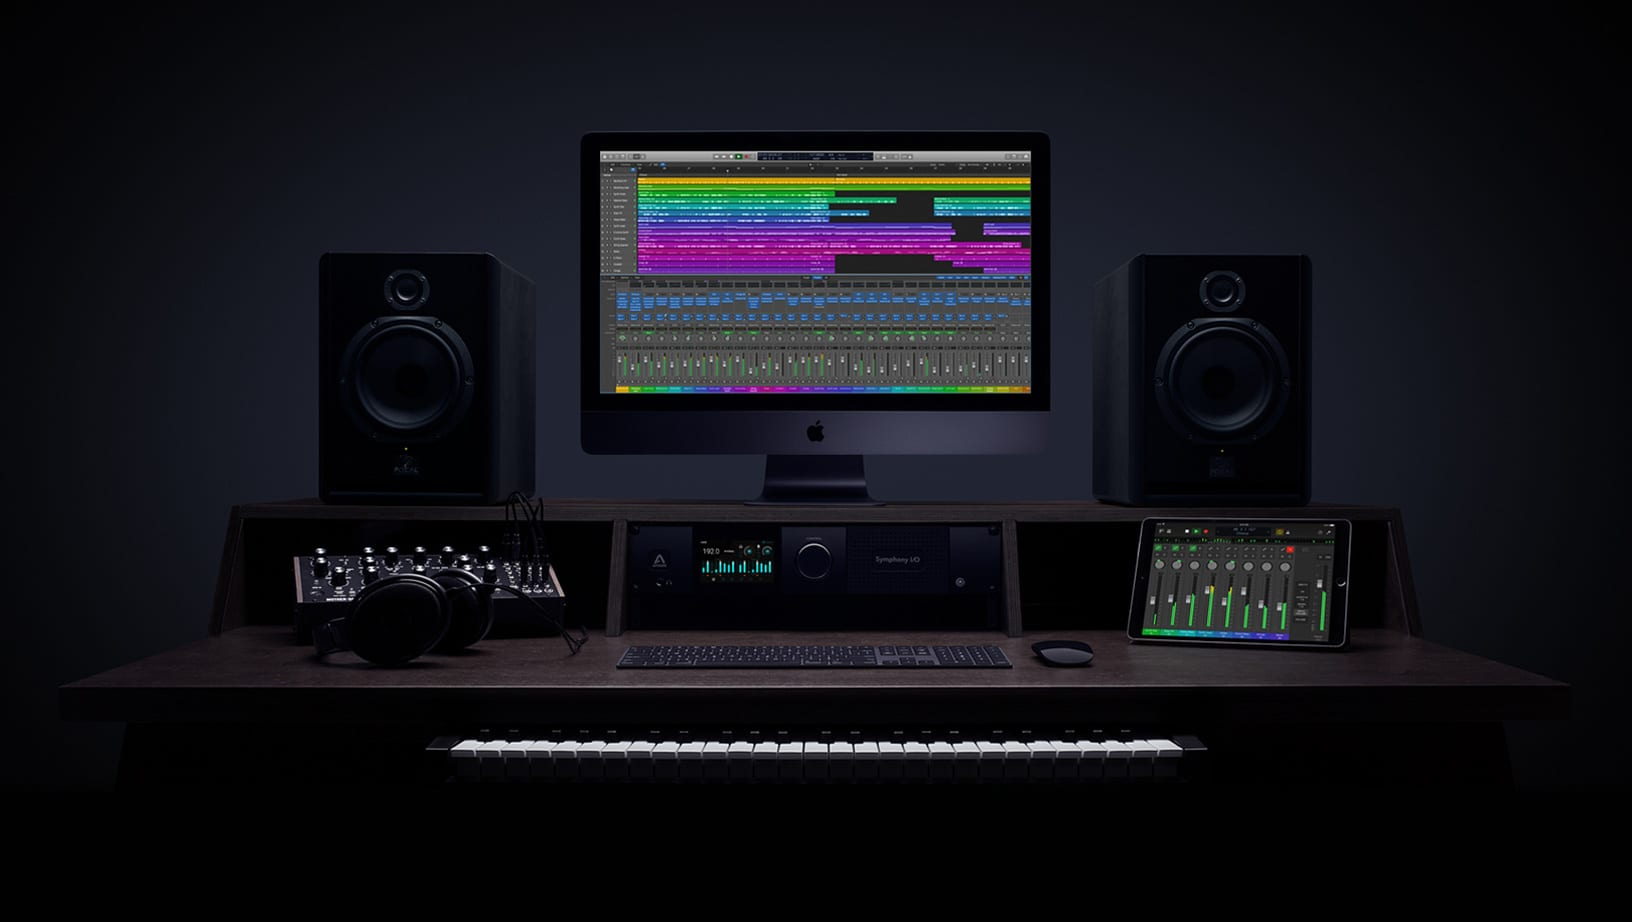 Logic Pro X 10.4 iMac